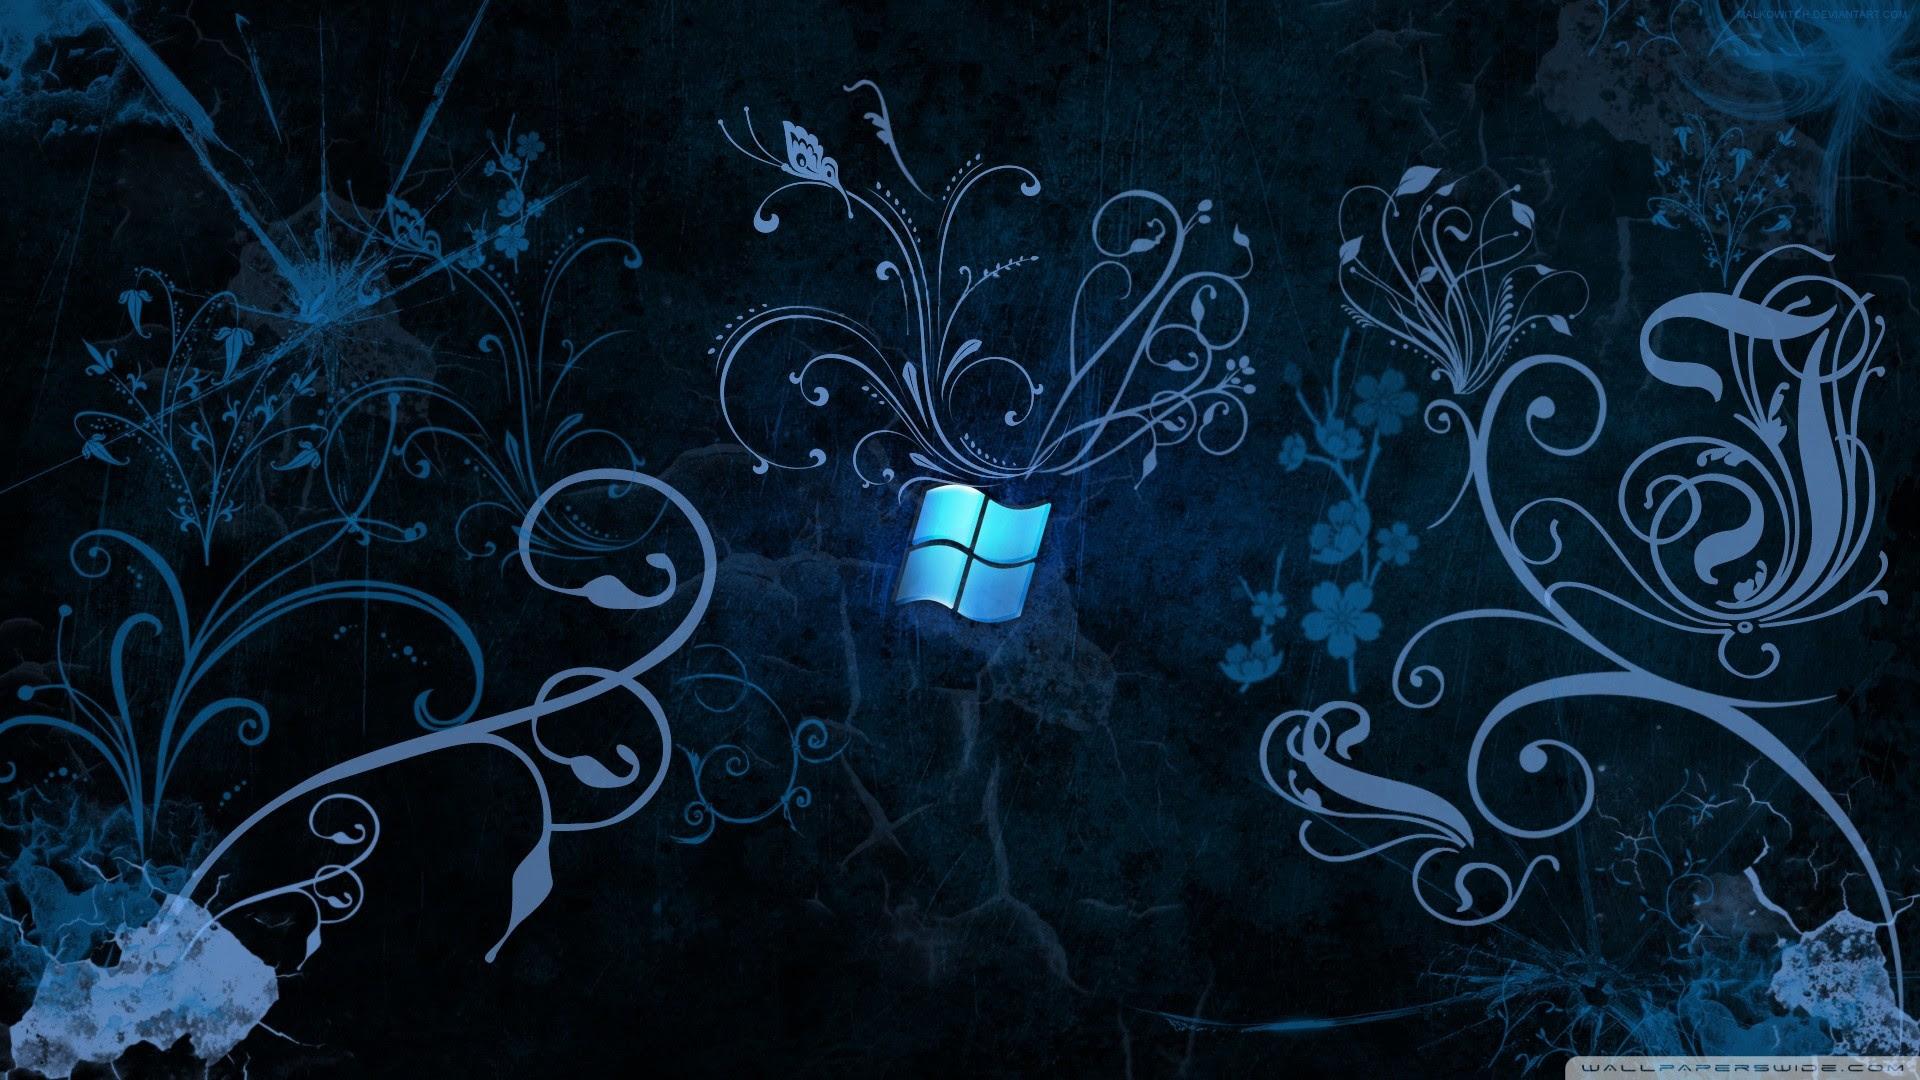 Gif Wallpaper Windows 8 Nice